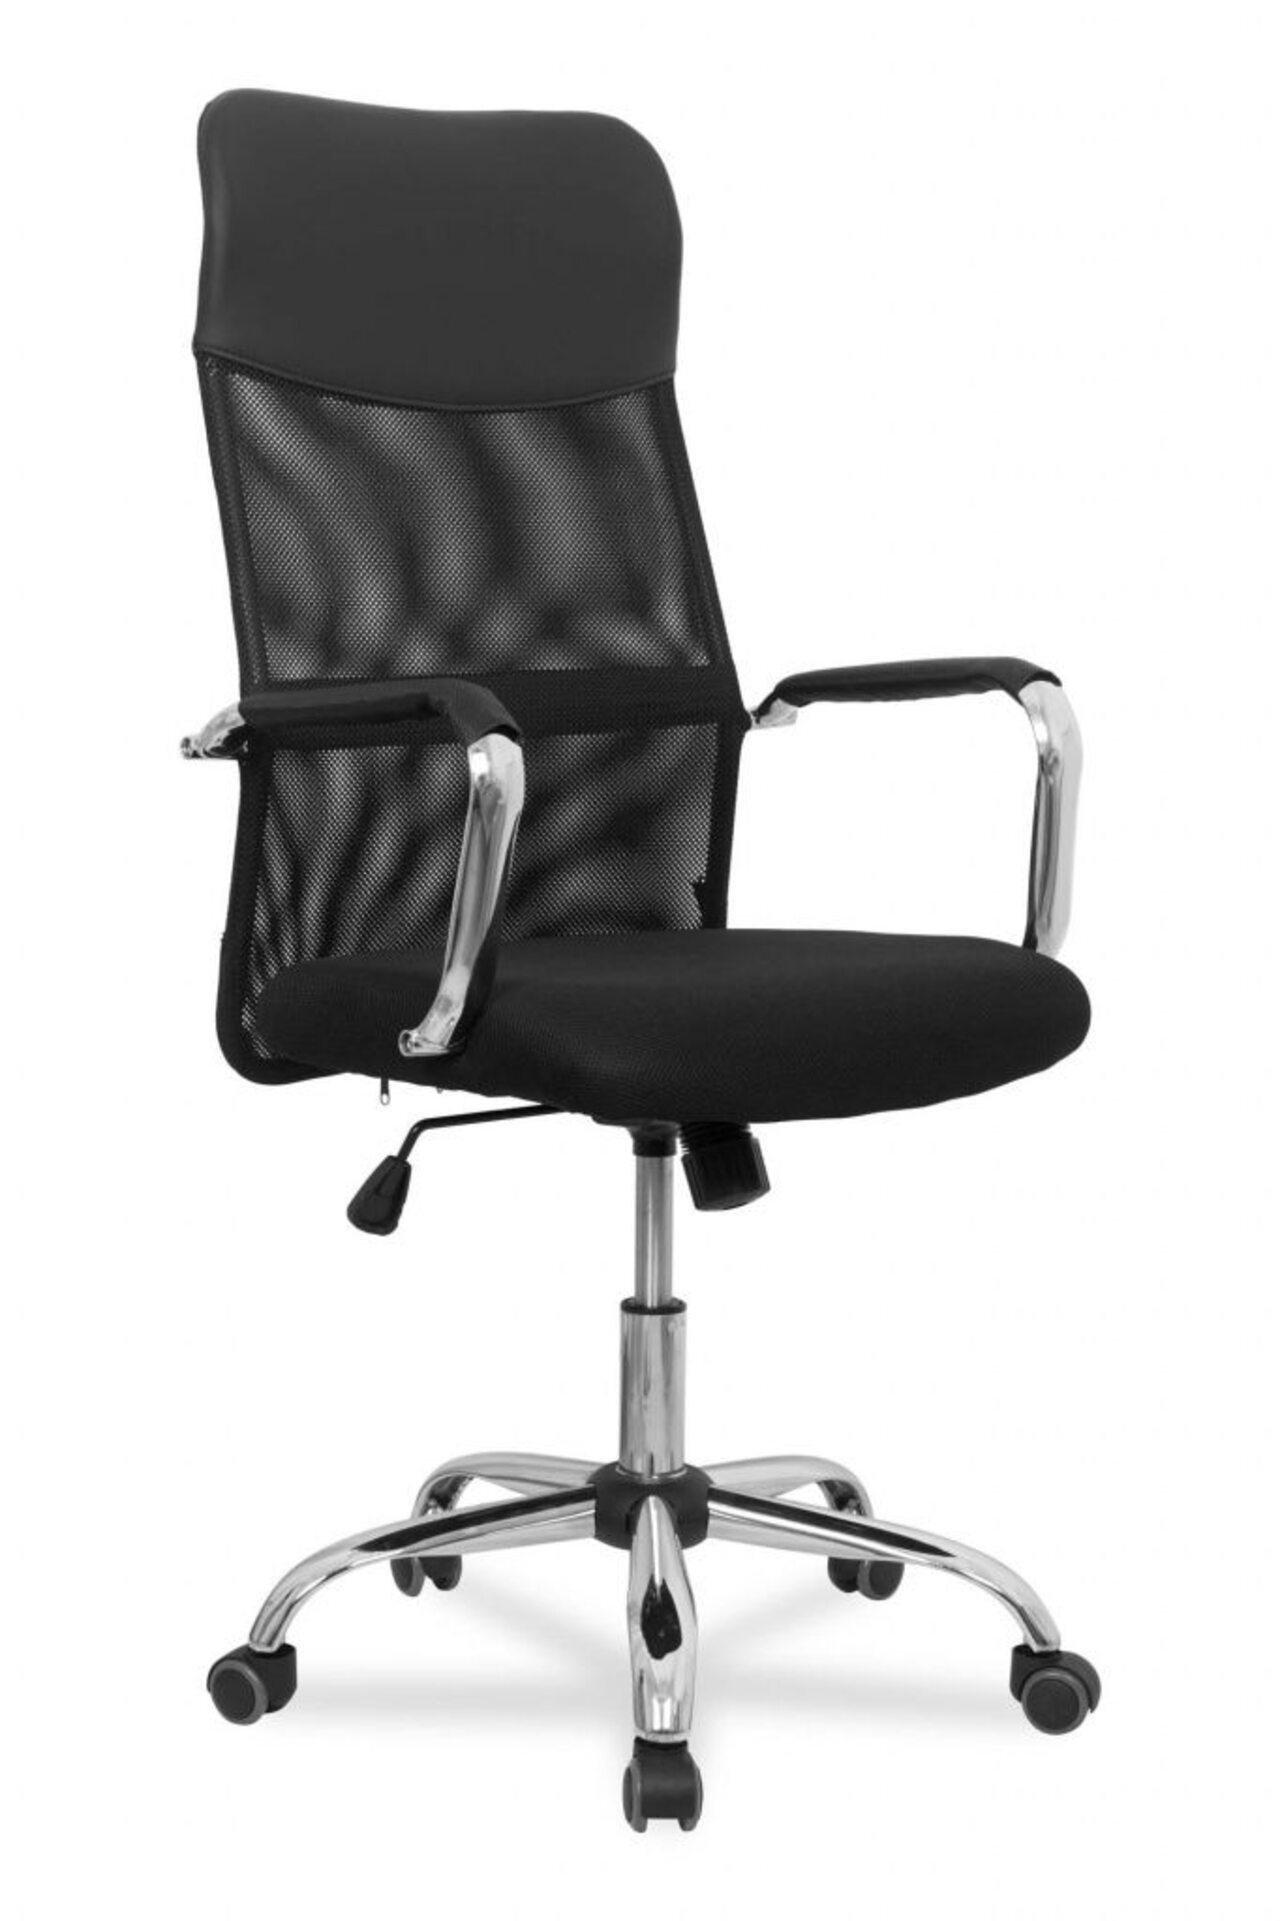 Кресло руководителя College CLG-419 MХН - фото 1